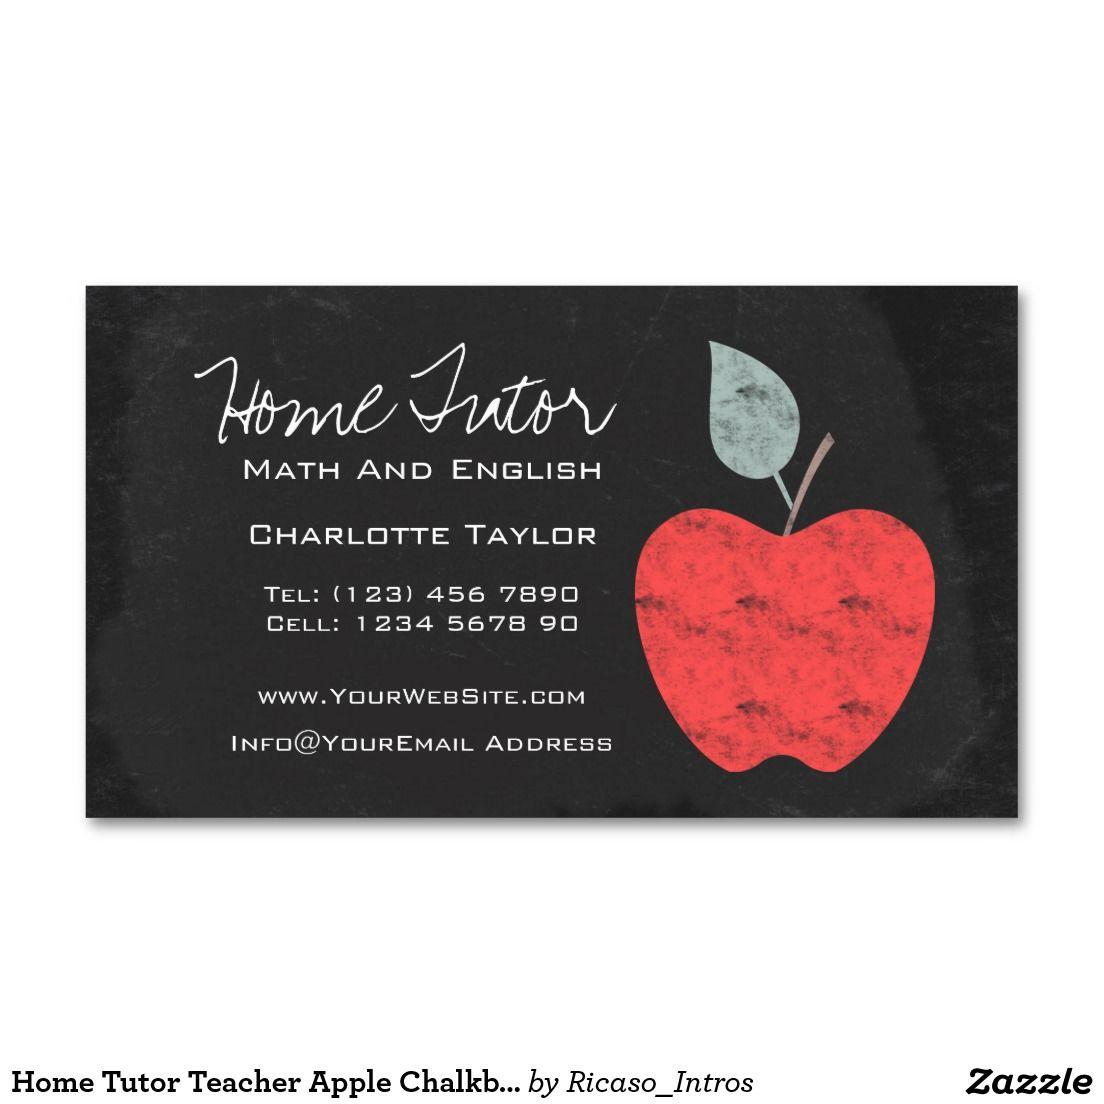 Home Tutor Teacher Apple Chalkboard Business Card   Business cards ...